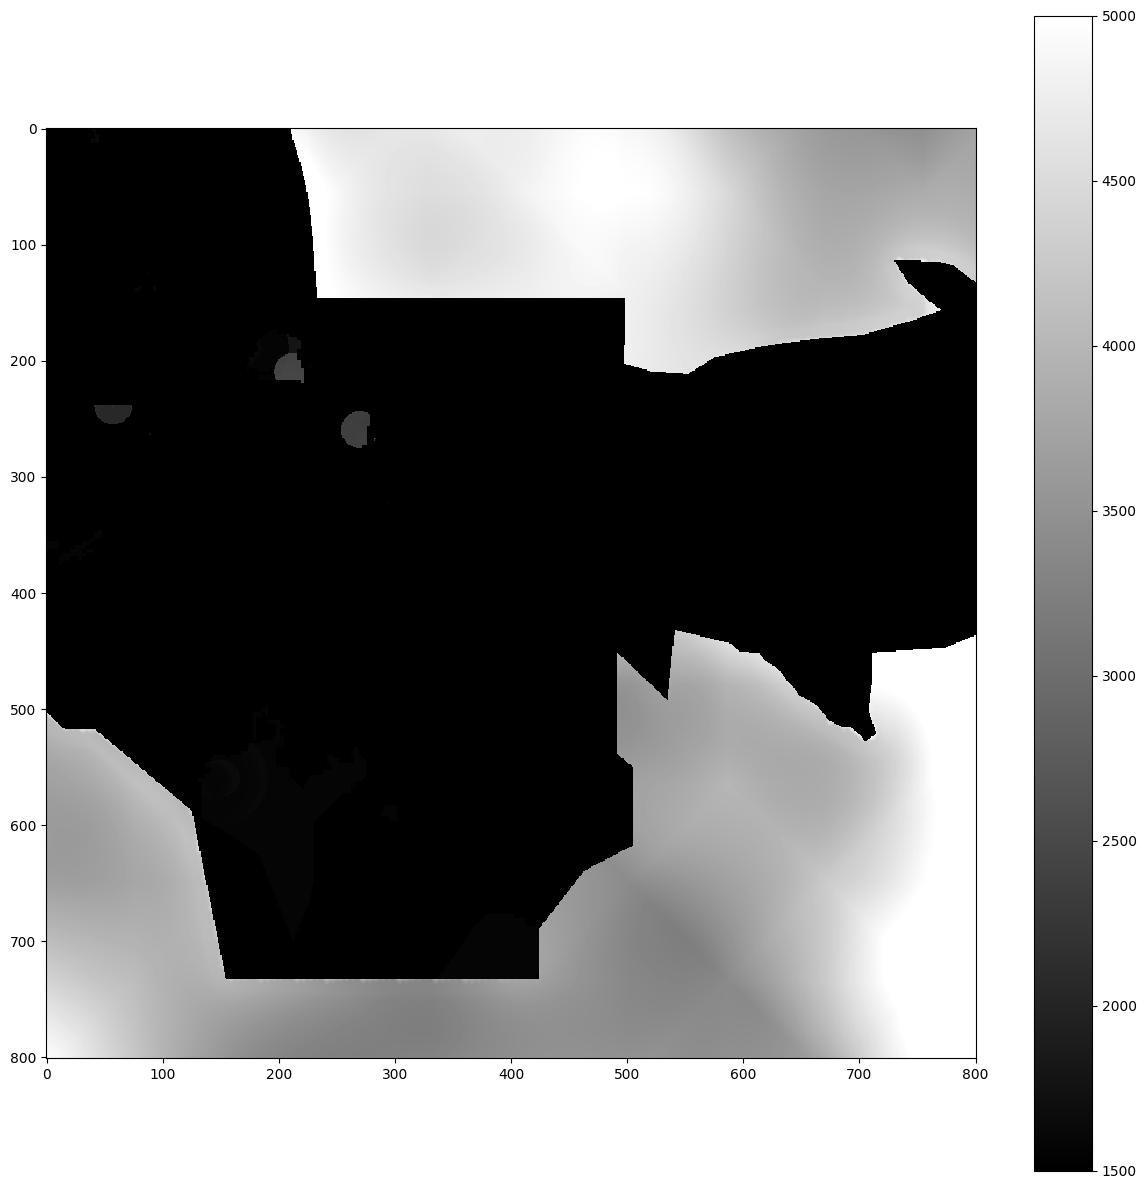 bench/seismic/wp/la_habra/meshes/velocity_model/plots/vp_10.png